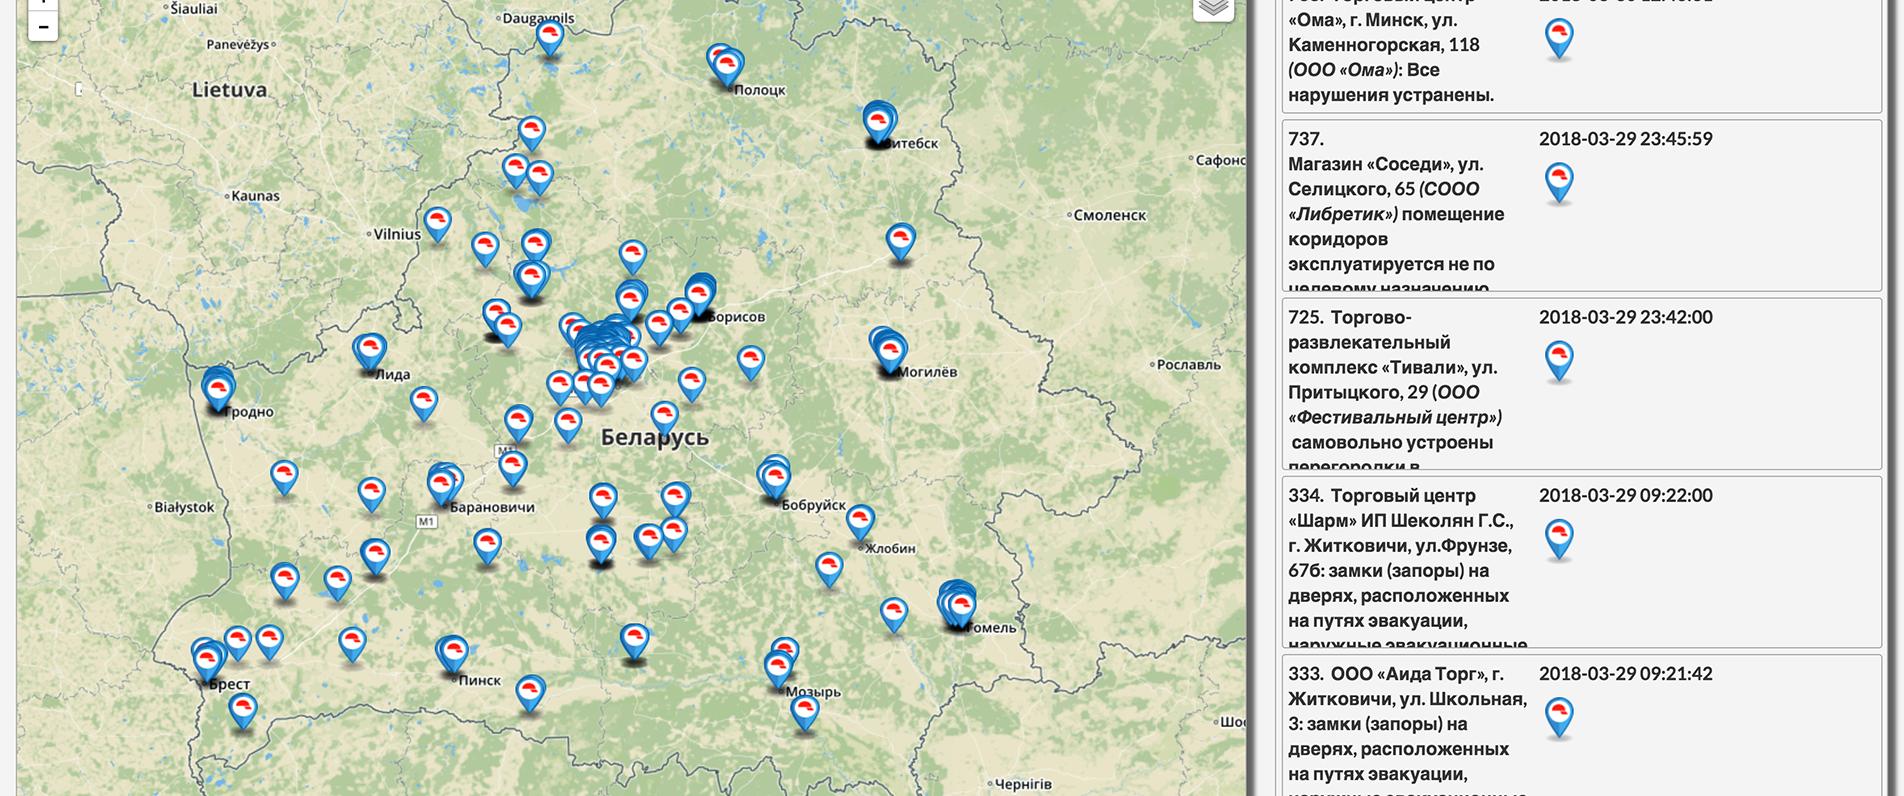 Карта проверок МЧС